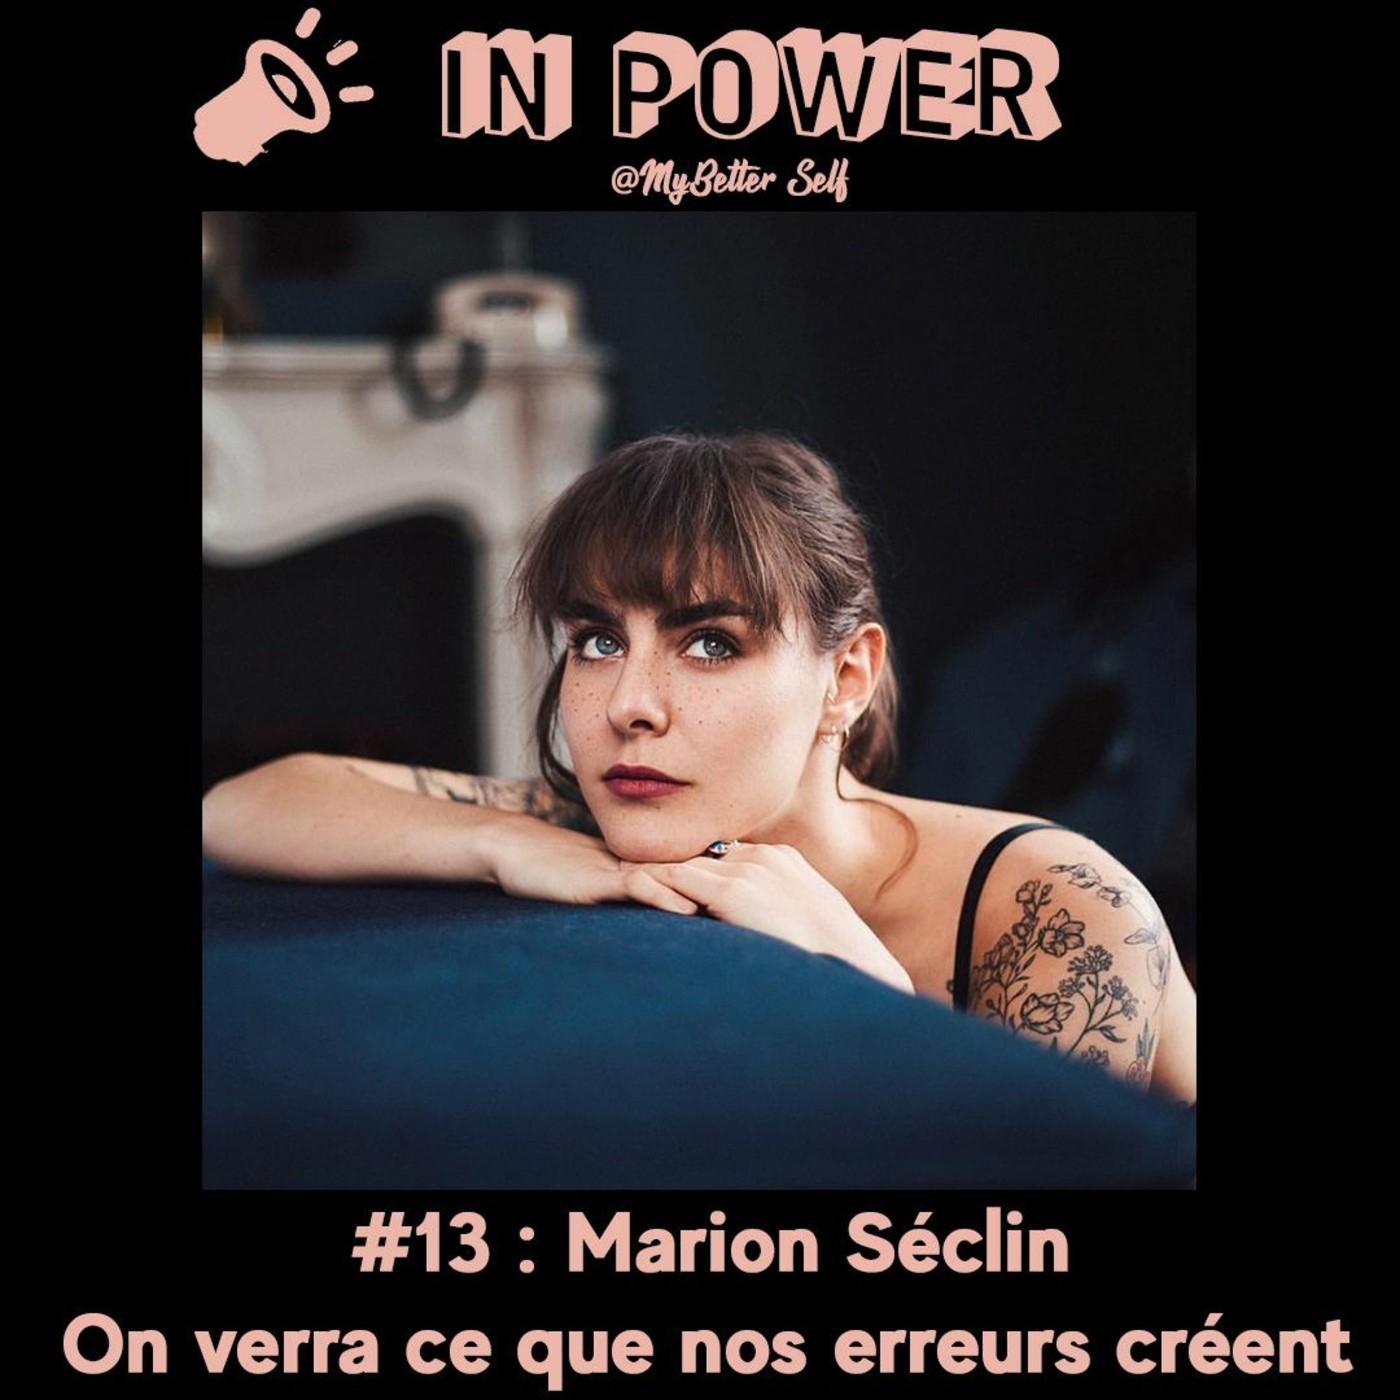 Marion Seclin - On verra ce que nos erreurs créent